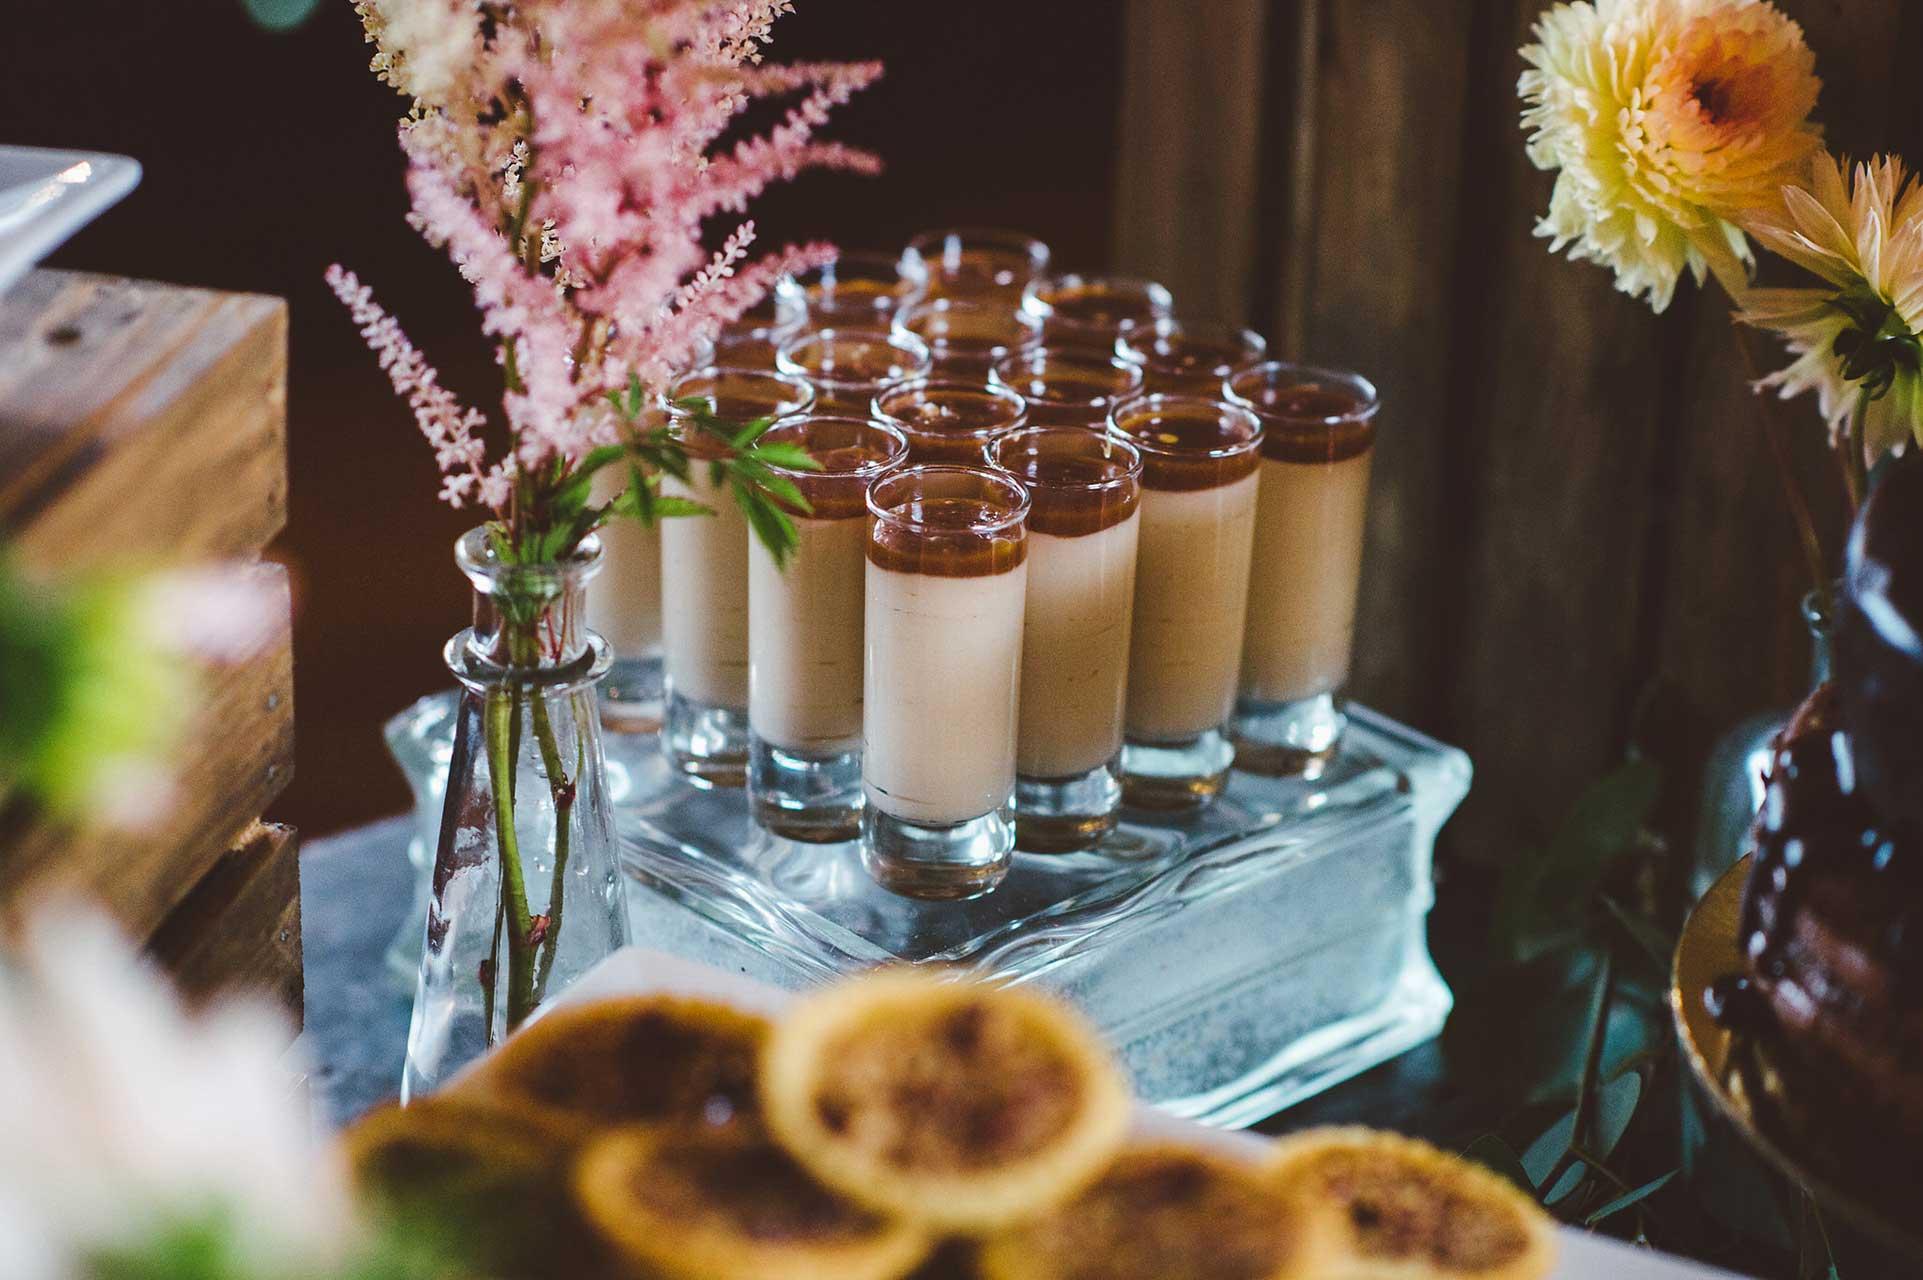 Wedding Venues Toronto - Dessert Reception - Sweet Table